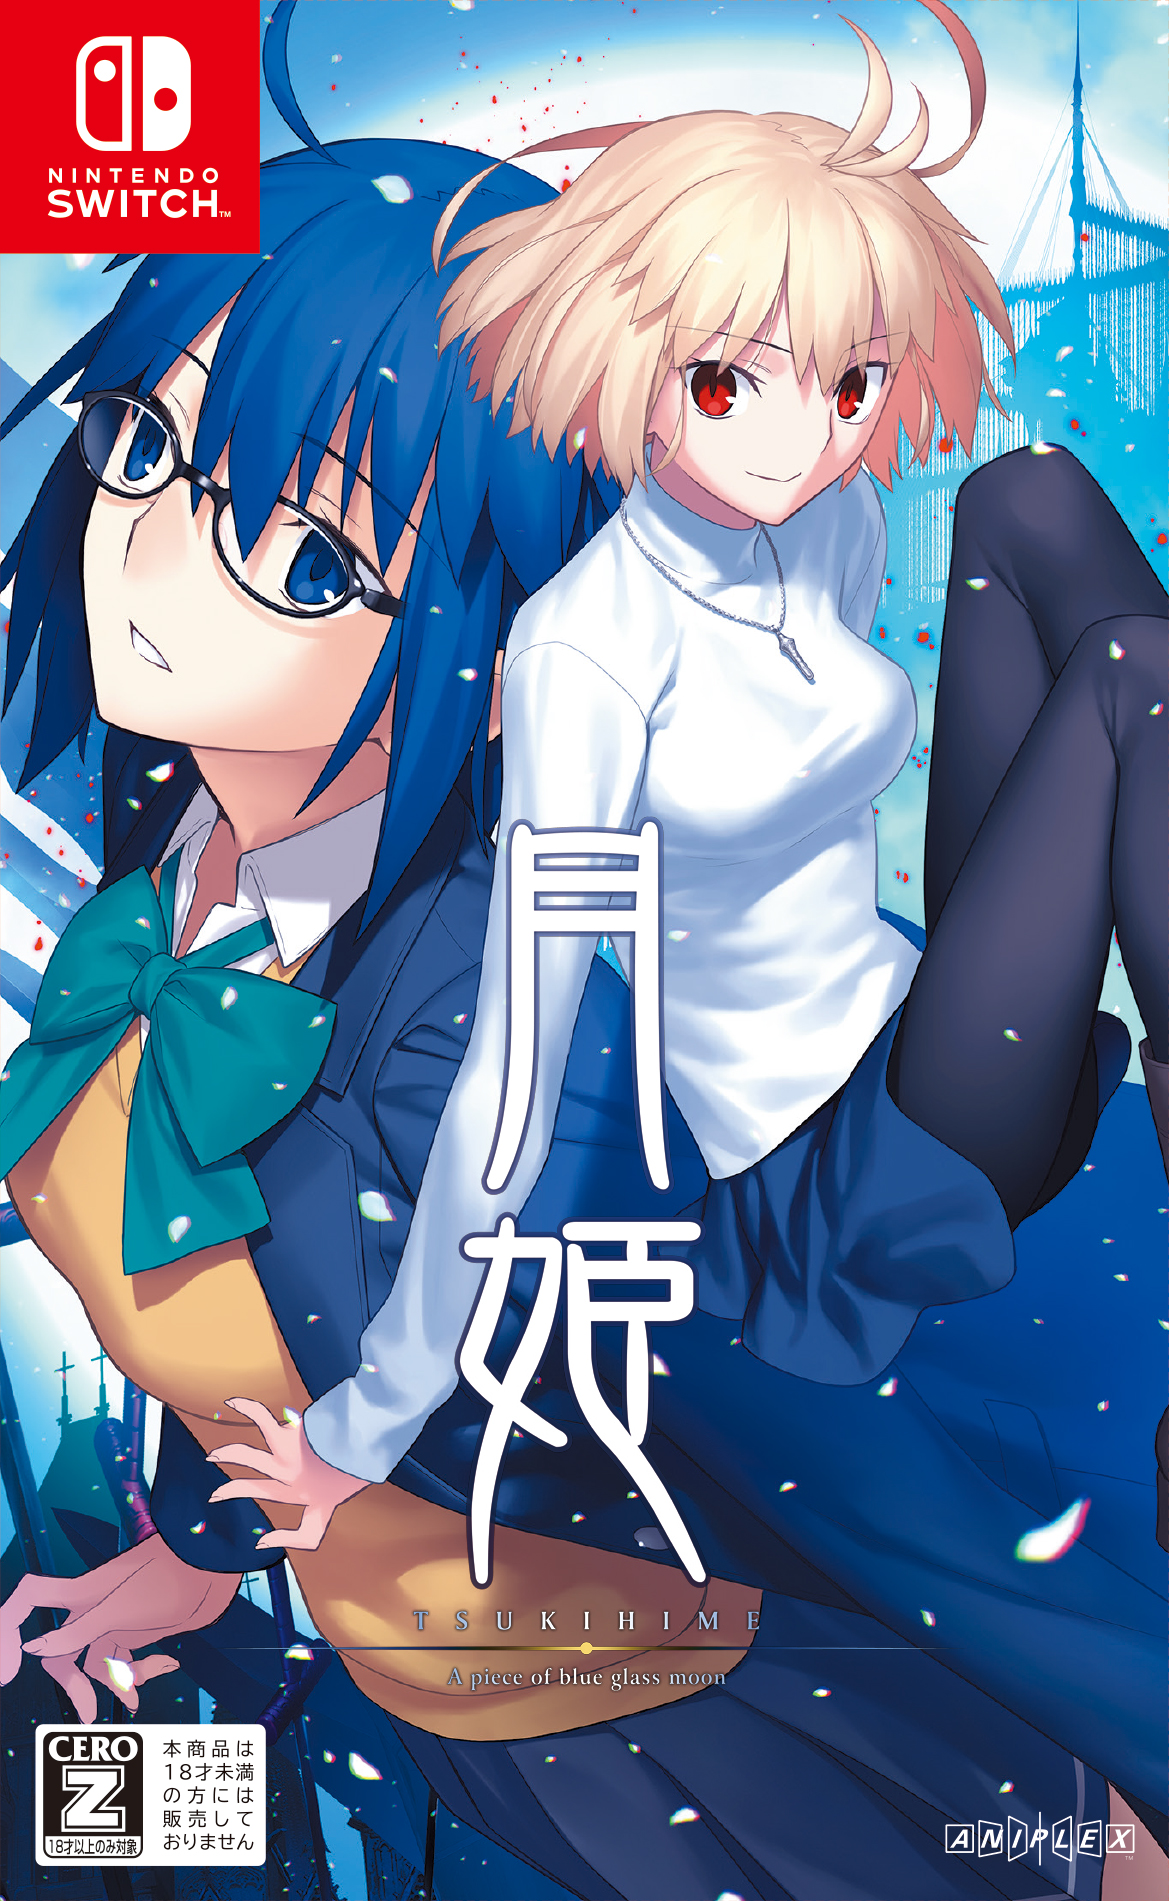 Tsukihime-A-Piece-of-Blue-Glass-Moon_202